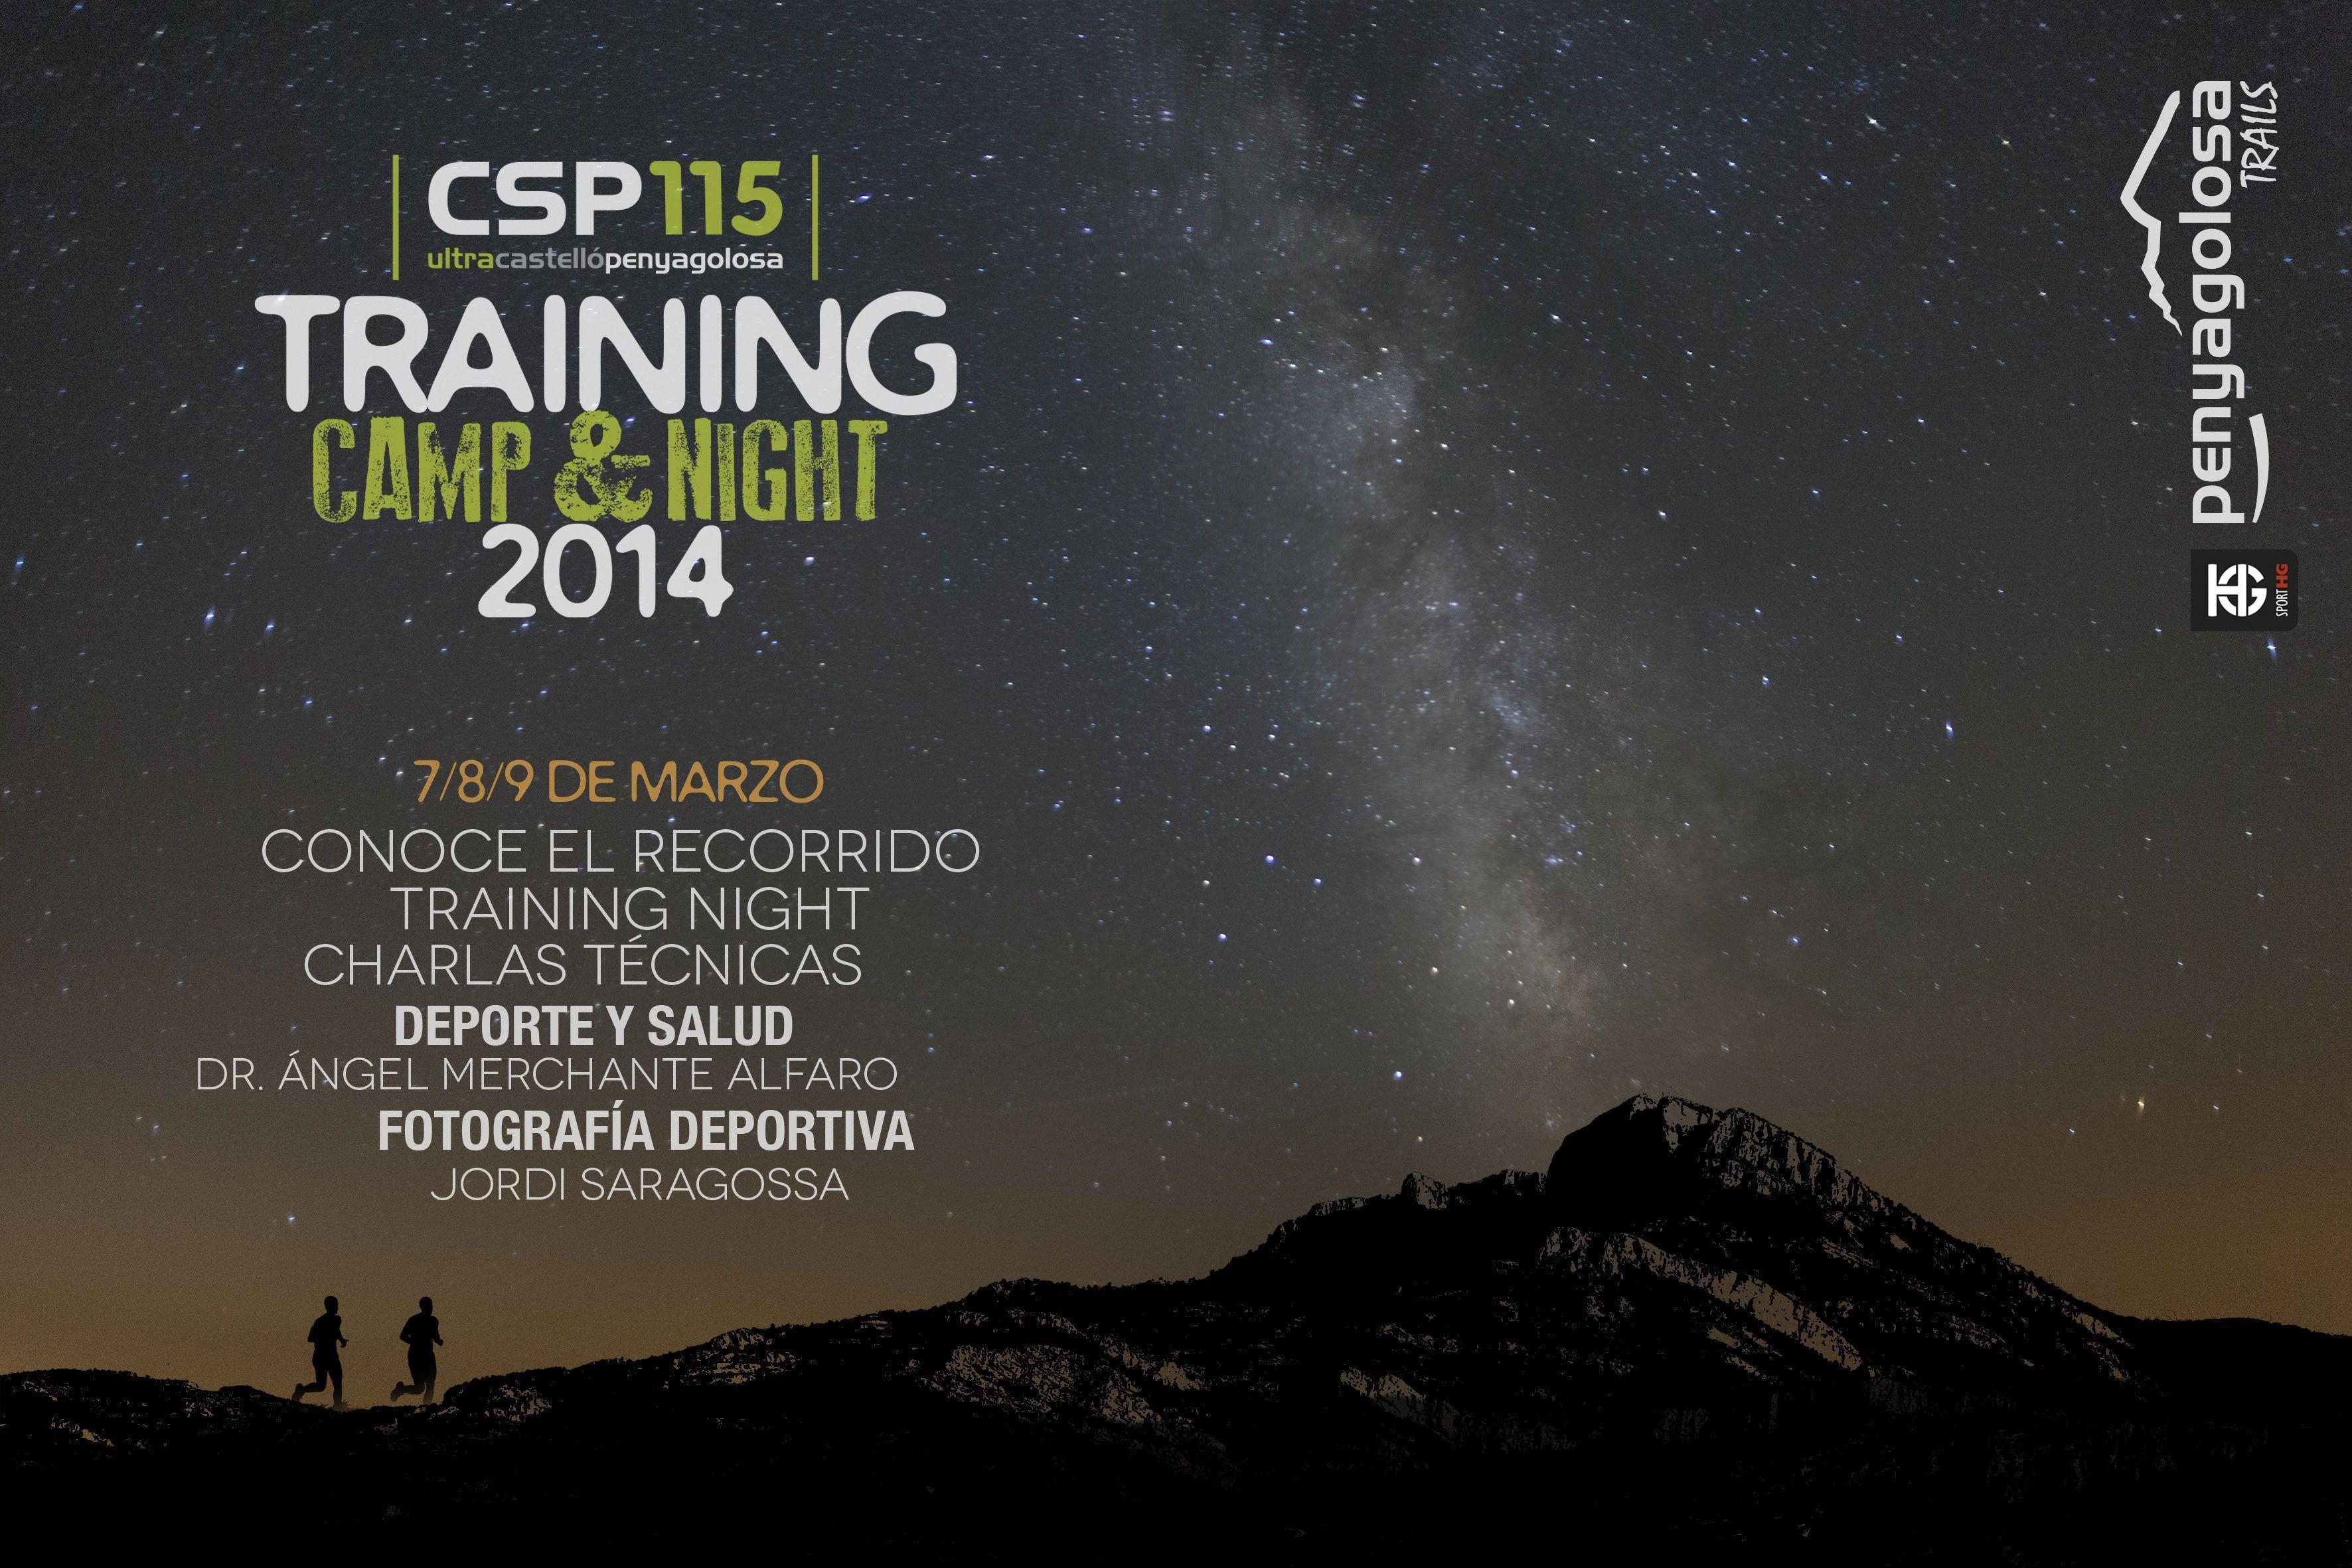 cartel_training2014_prensa_oka